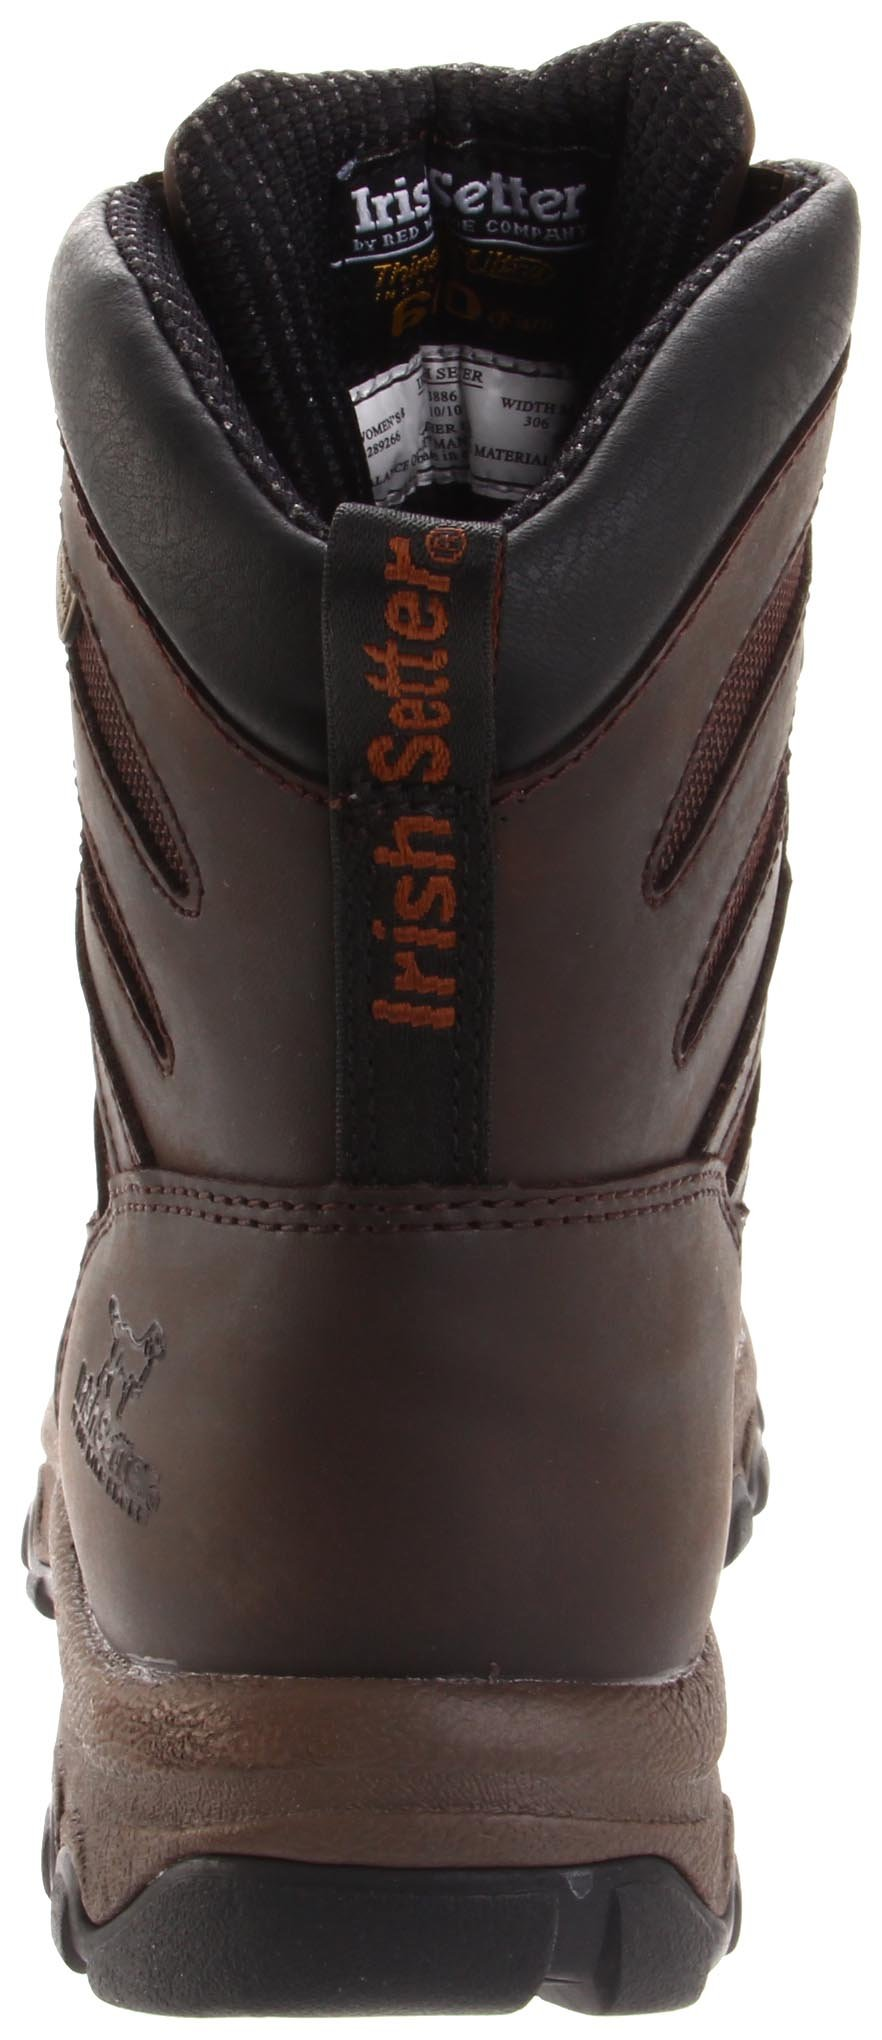 Irish Setter Women's LadyHawk Waterproof 600 Gram 7'' Big Game Boot,Brown,5 B US by Irish Setter (Image #2)